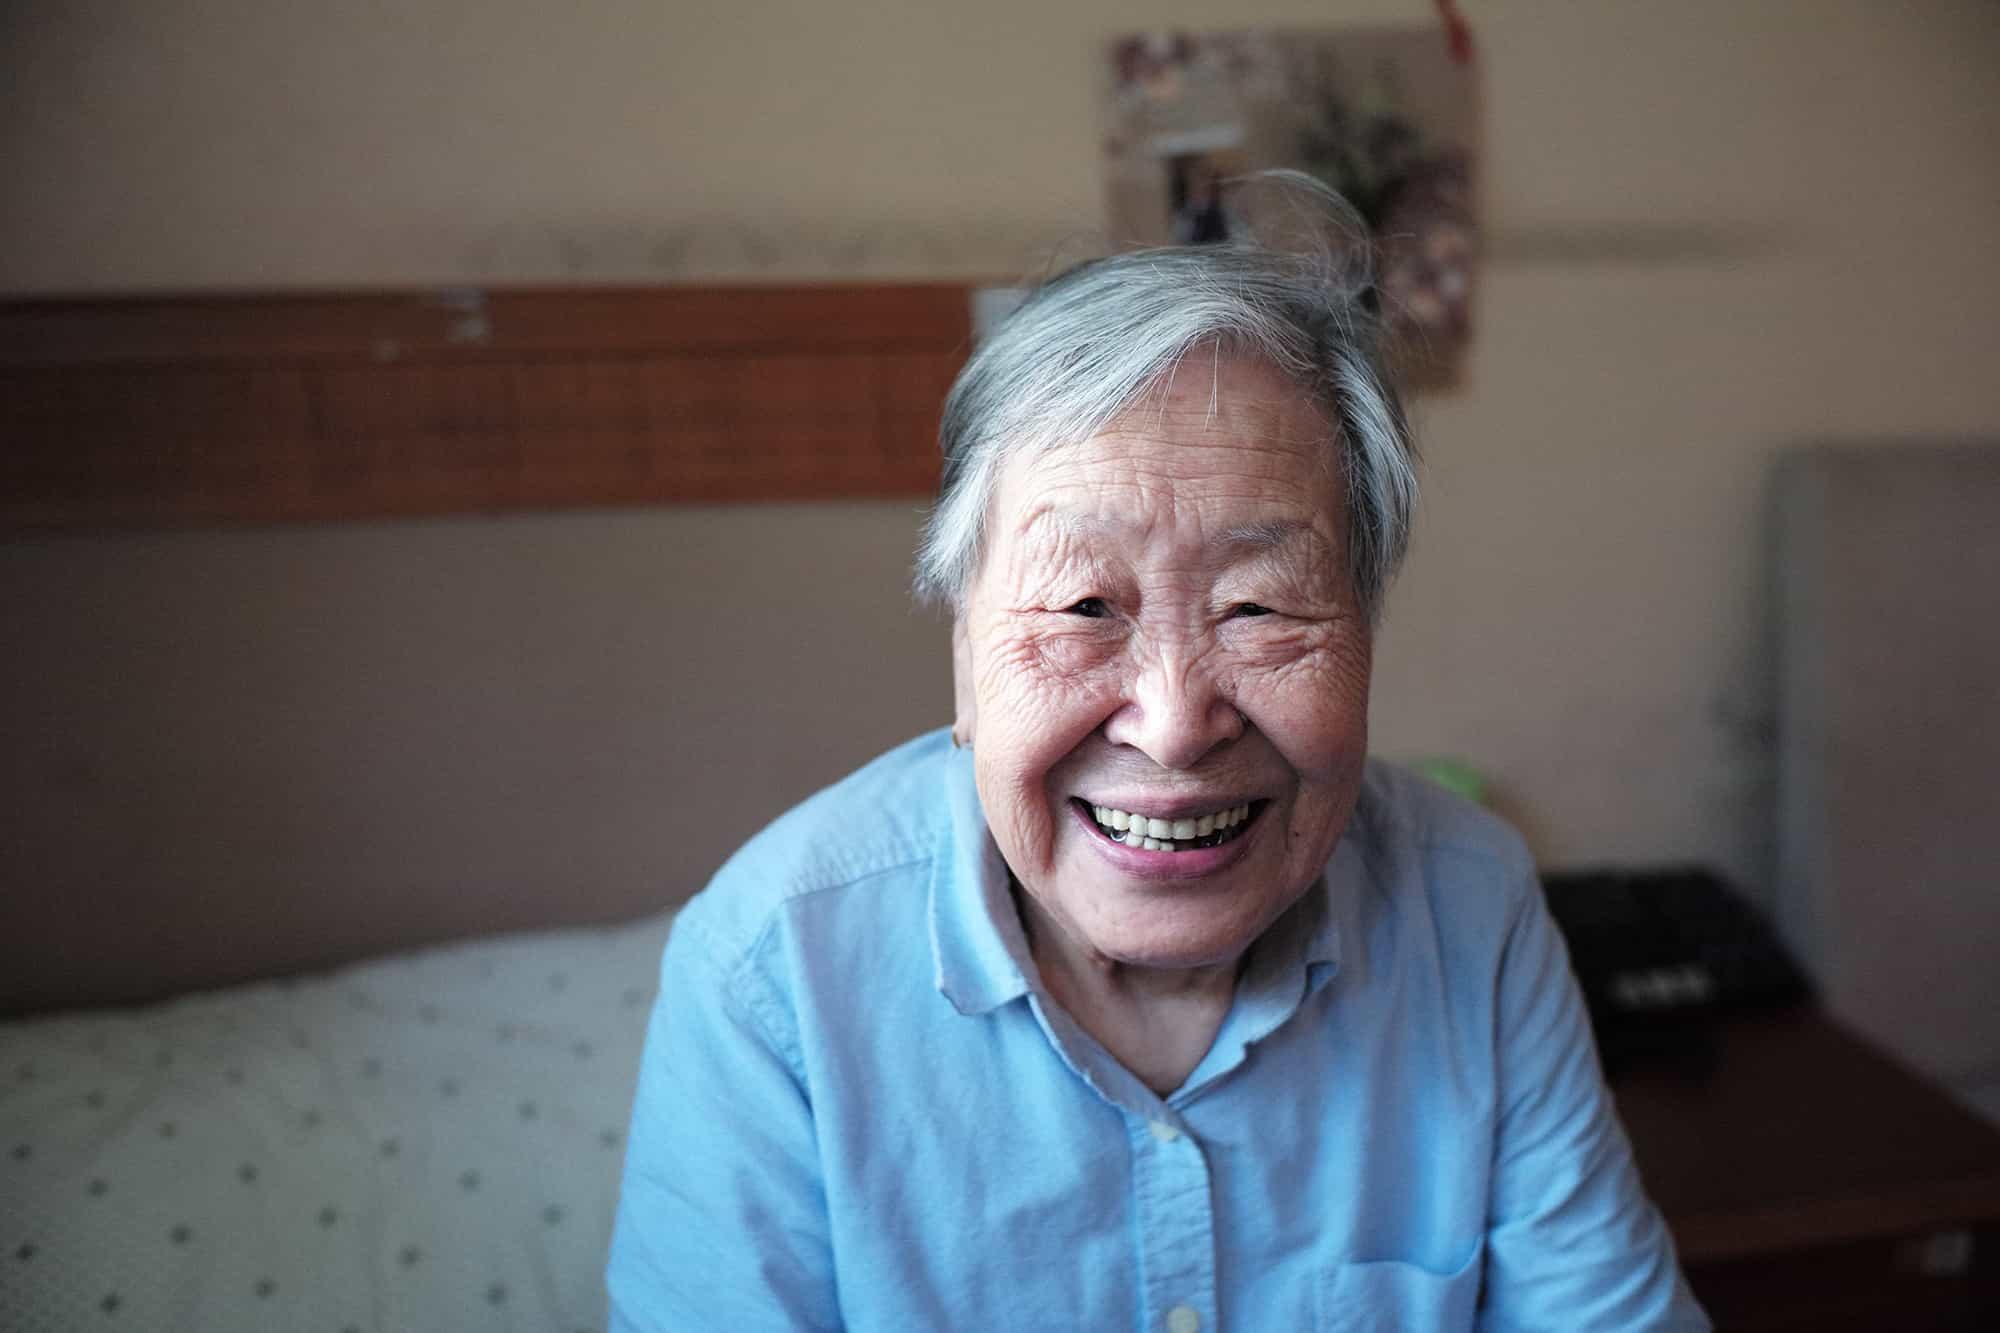 elderly woman insurance elderly nursing home